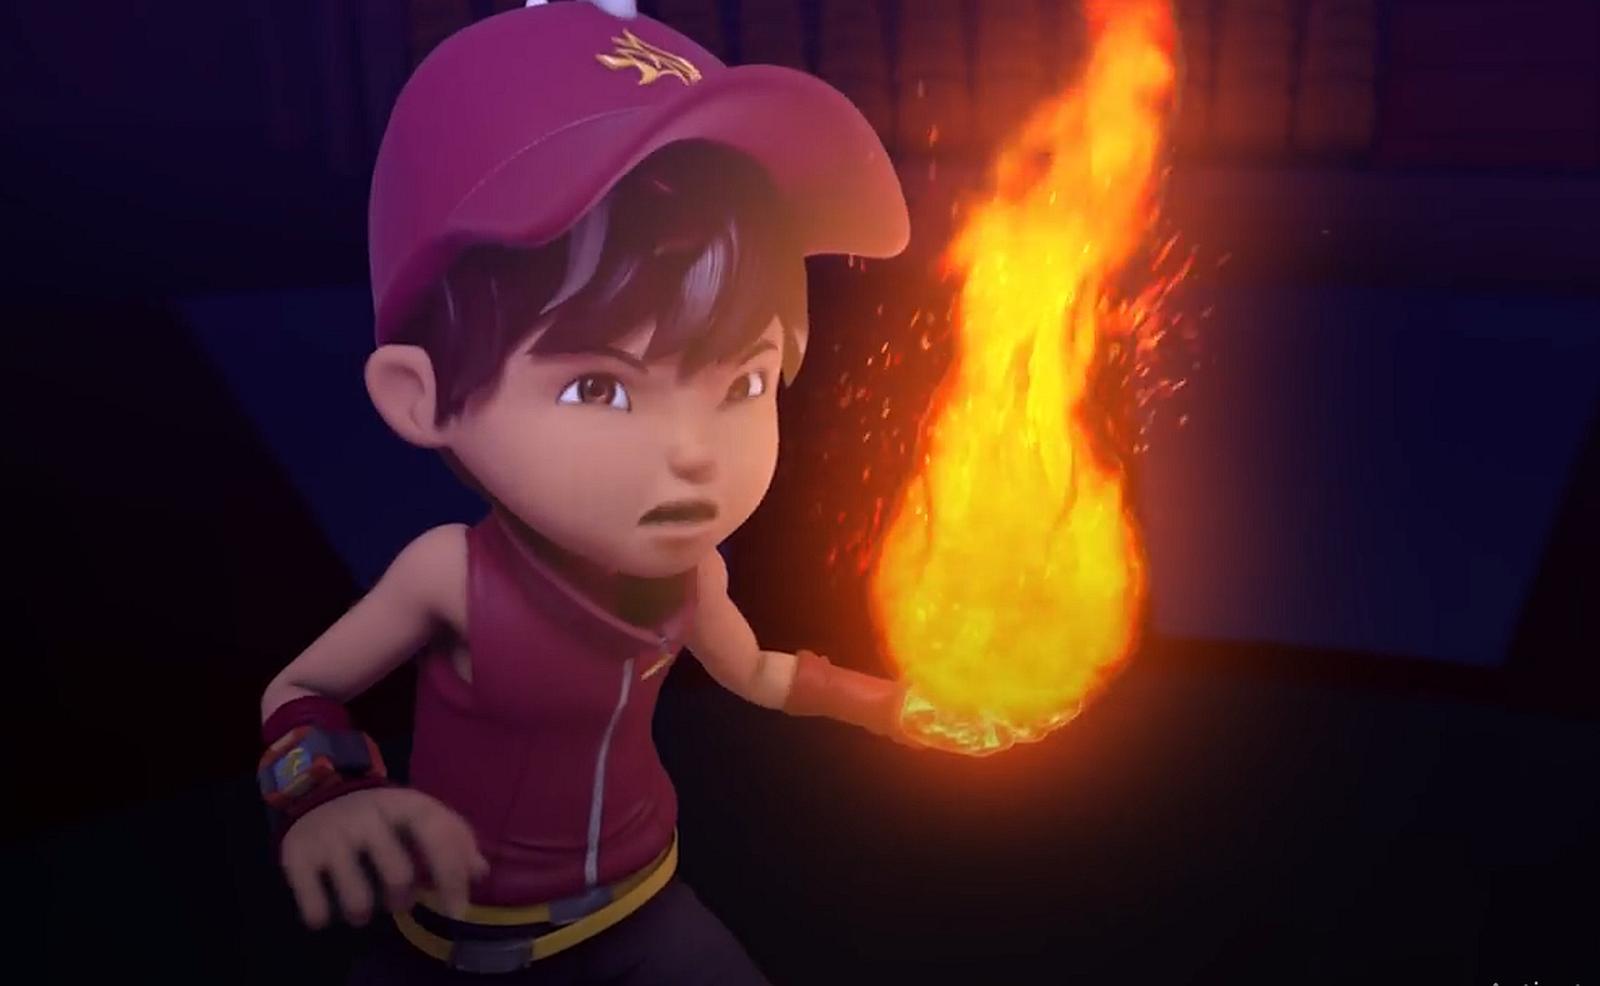 3000+ Gambar Boboiboy Galaxy Api  Gratis